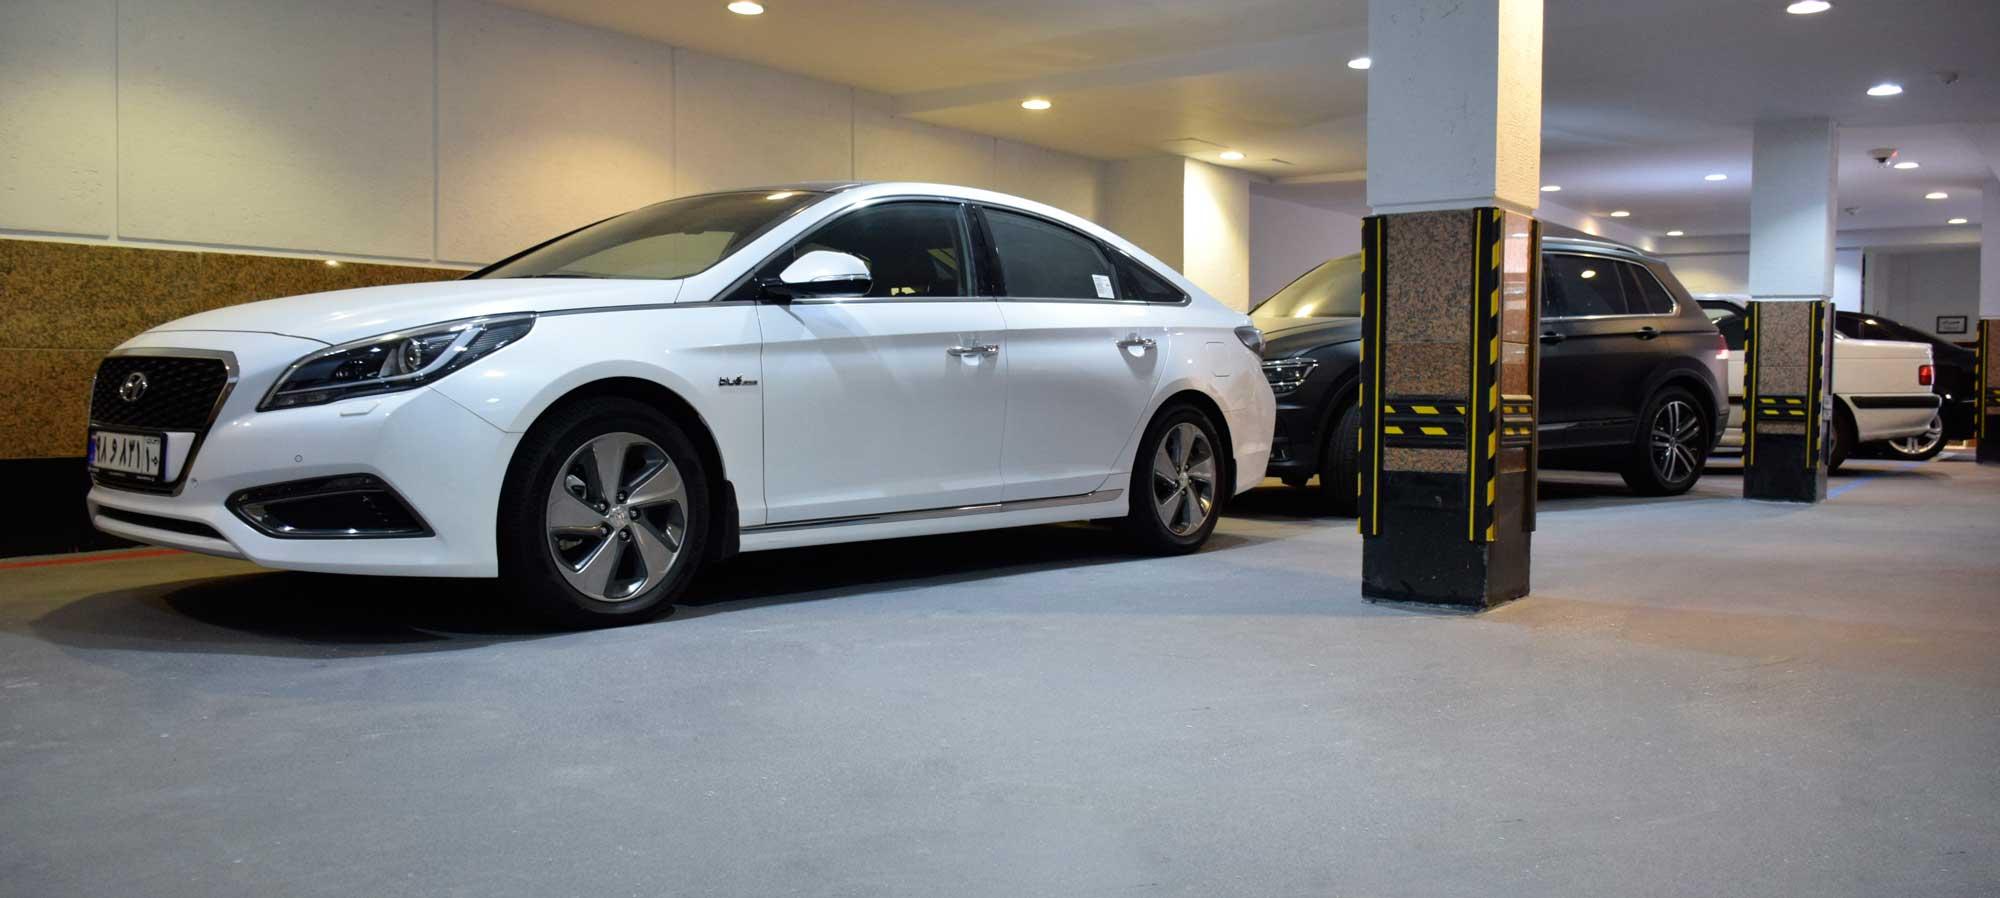 carpark-flooring-کفپوش-پارکینگی